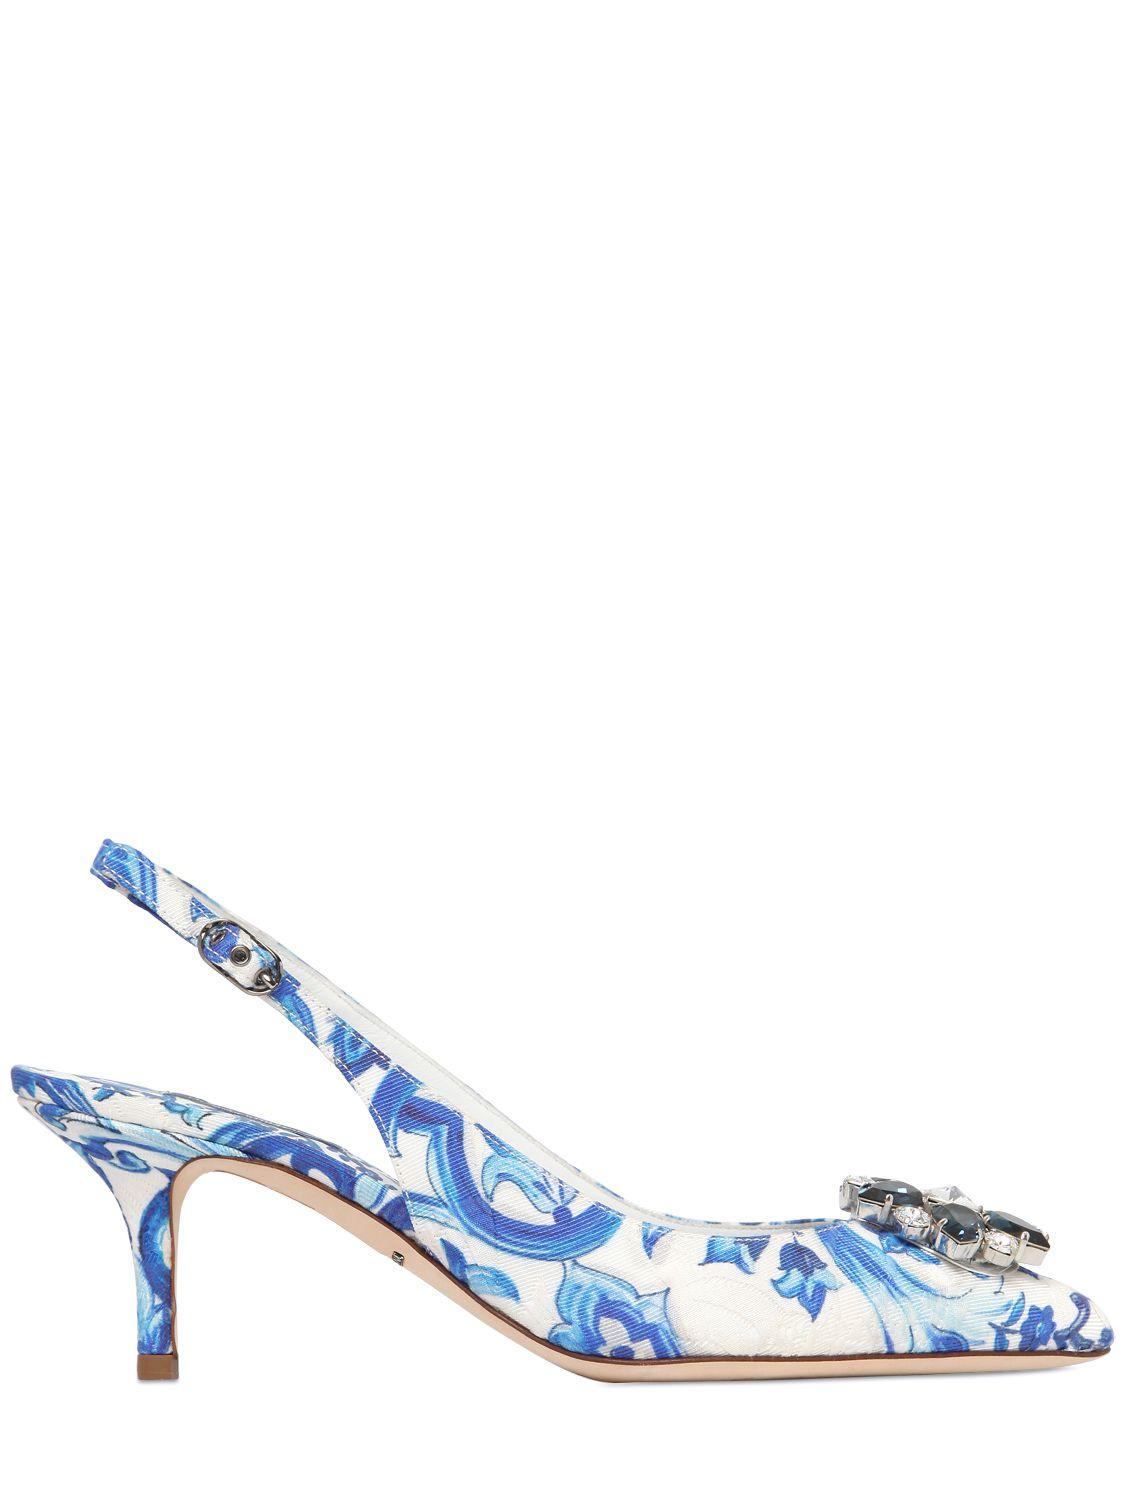 Dolce & Gabbana Brocade Slingback Pumps discount finishline best prices best sale cheap online cheap sale manchester great sale popular sale online tyuTS9Y1